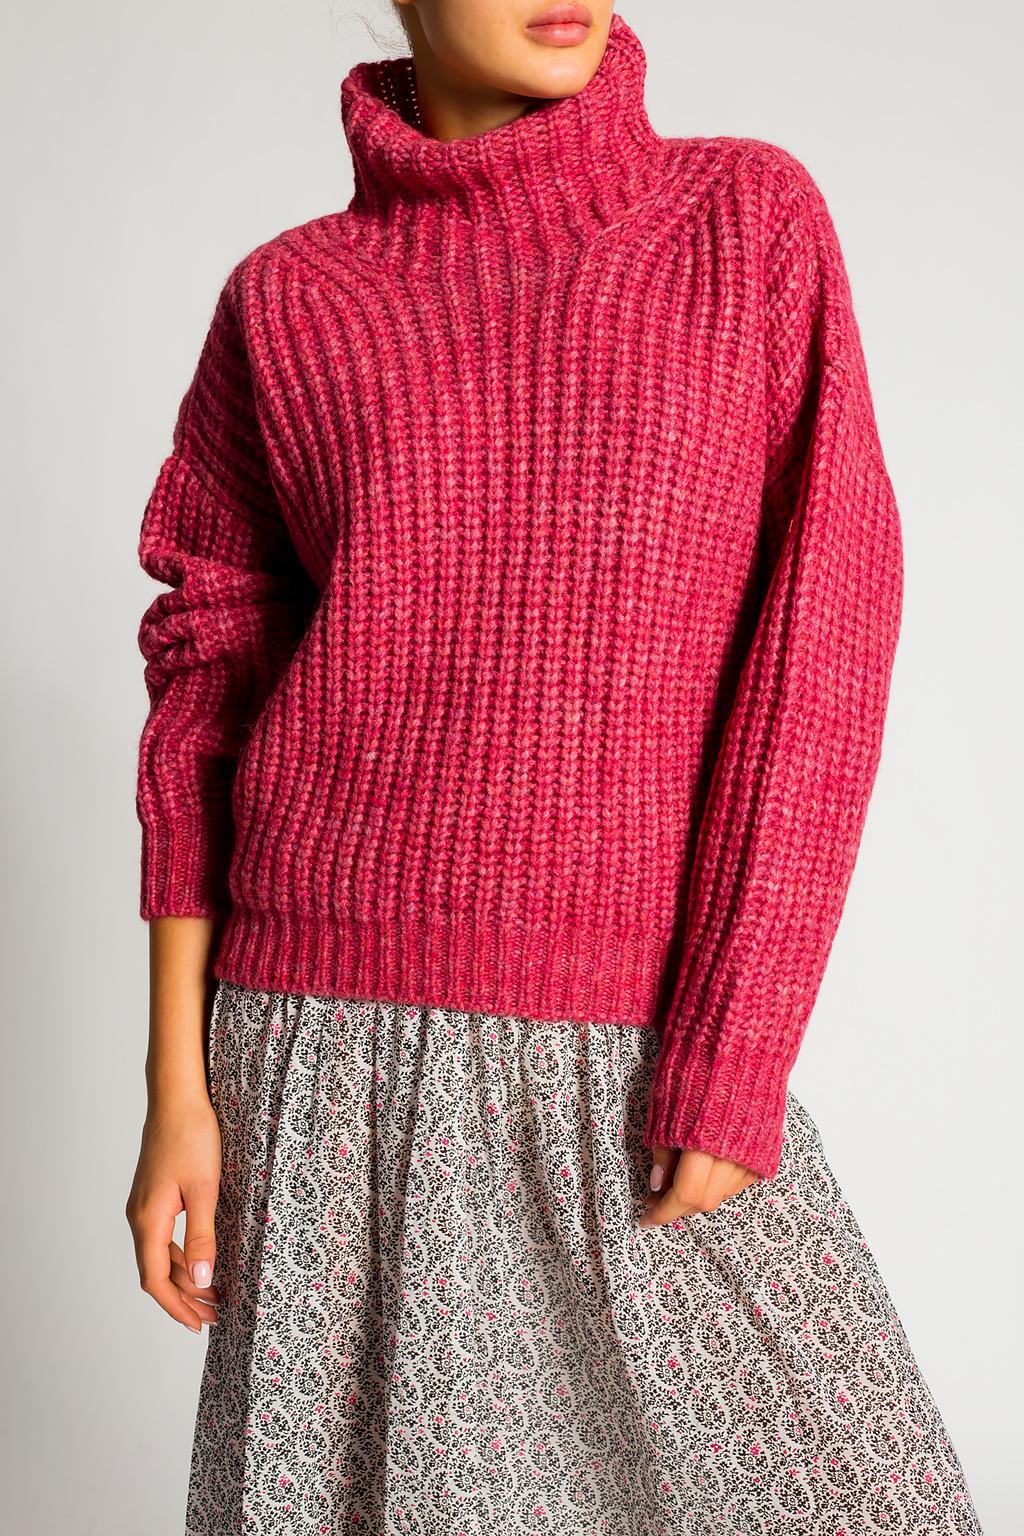 Isabel Marant Rib-knit turtleneck sweater